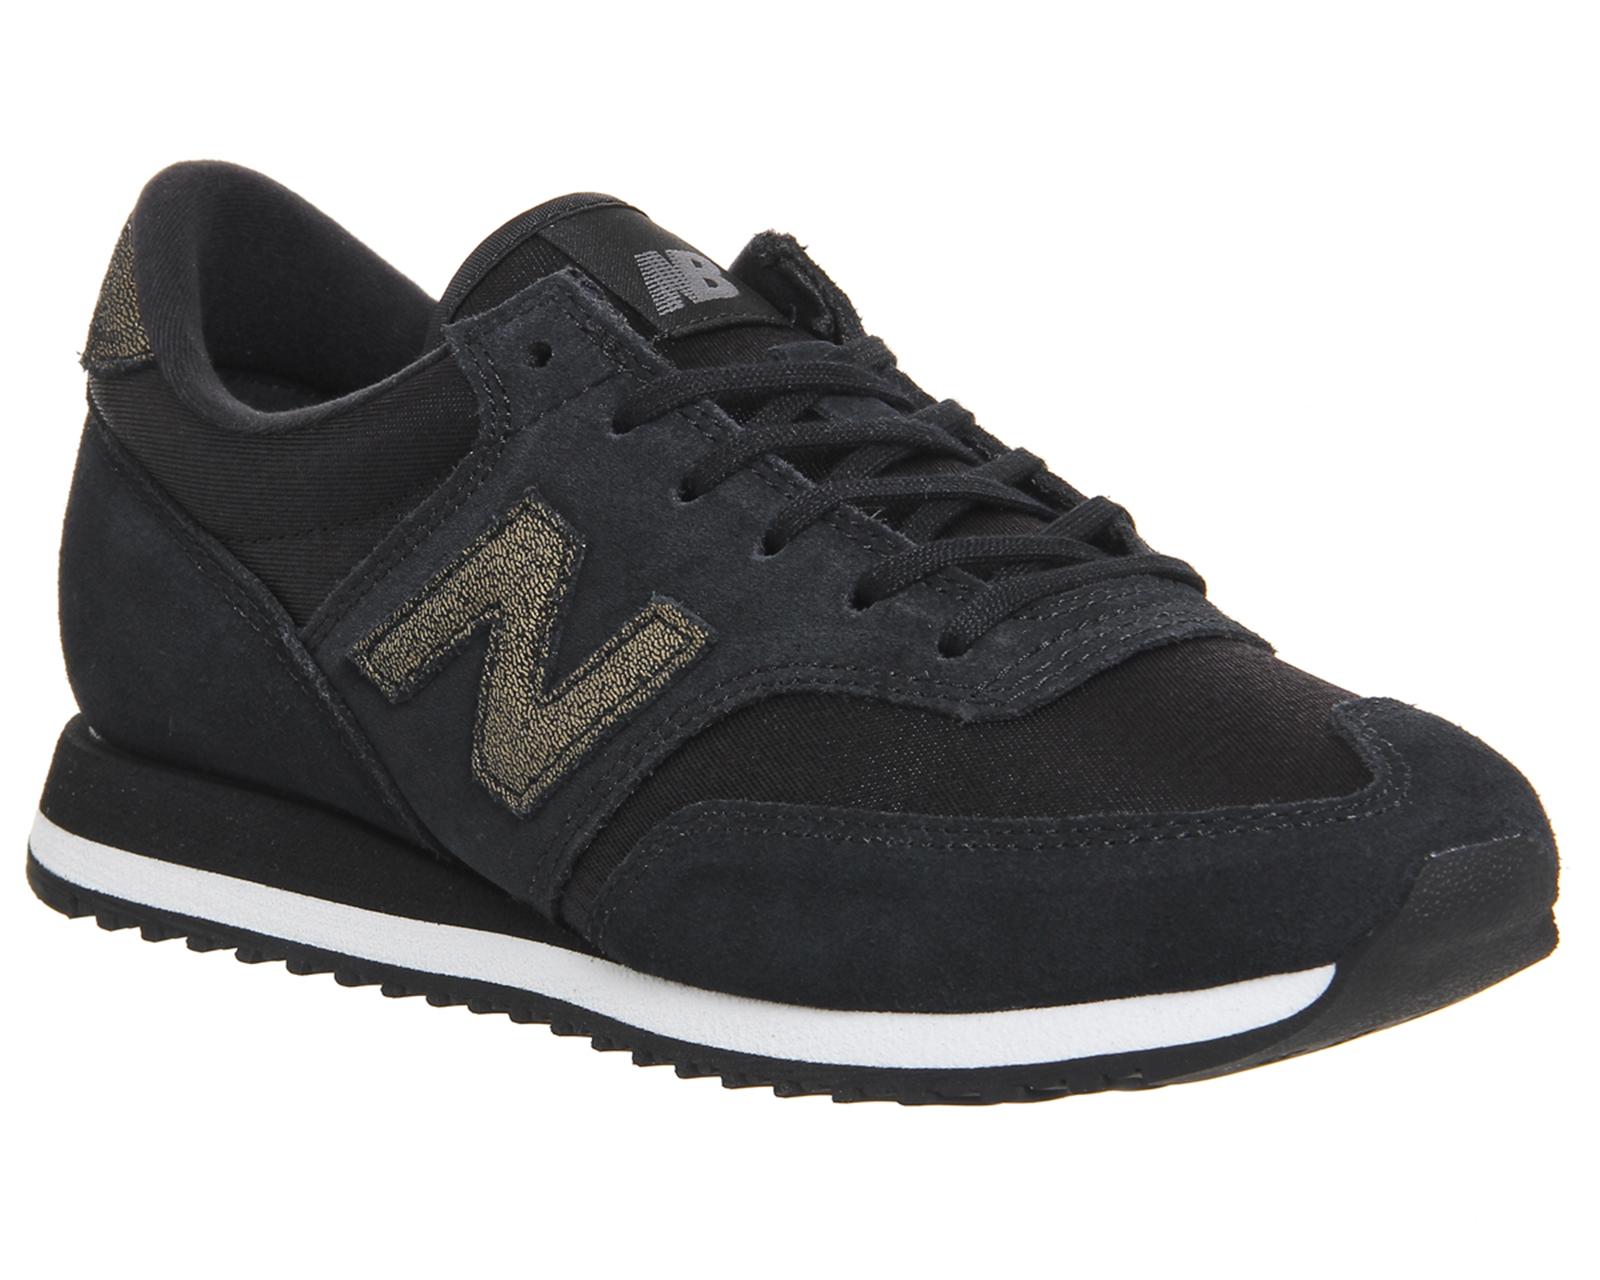 New Balance 620 zapatos